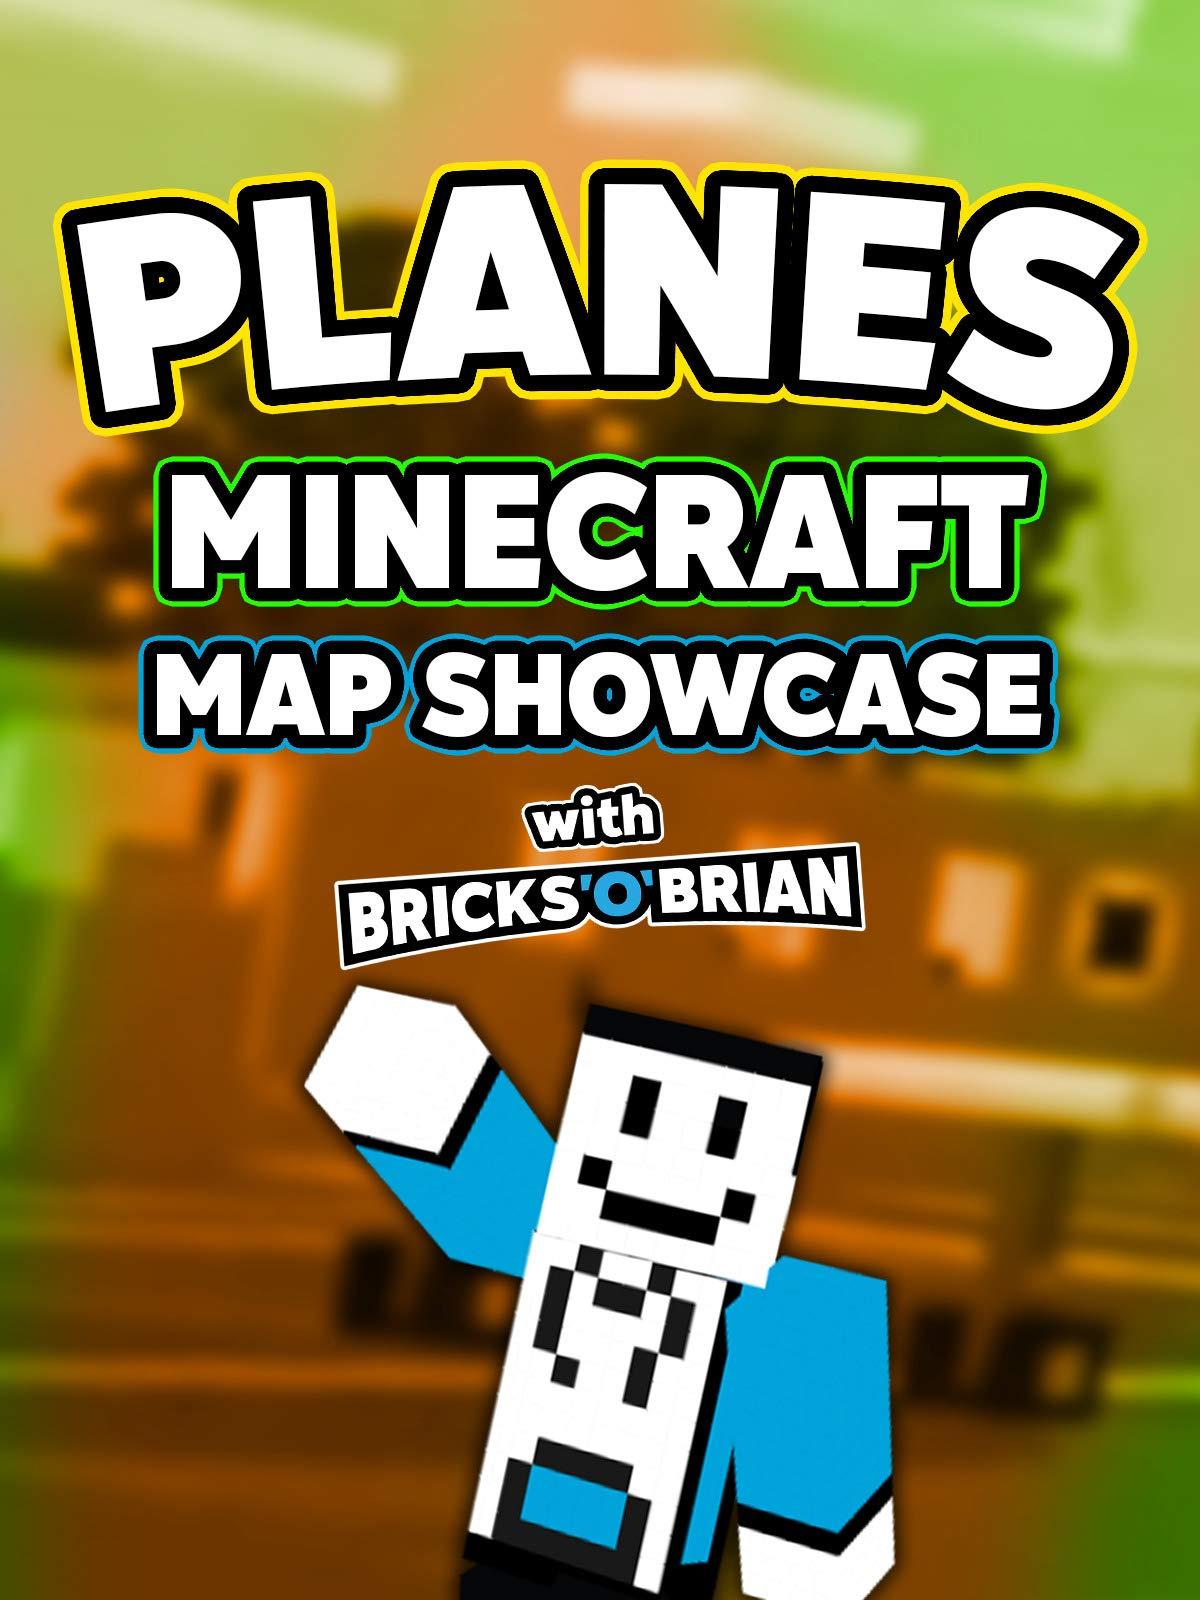 Clip: Planes Minecraft Map Showcase with Bricks 'O' Brian!